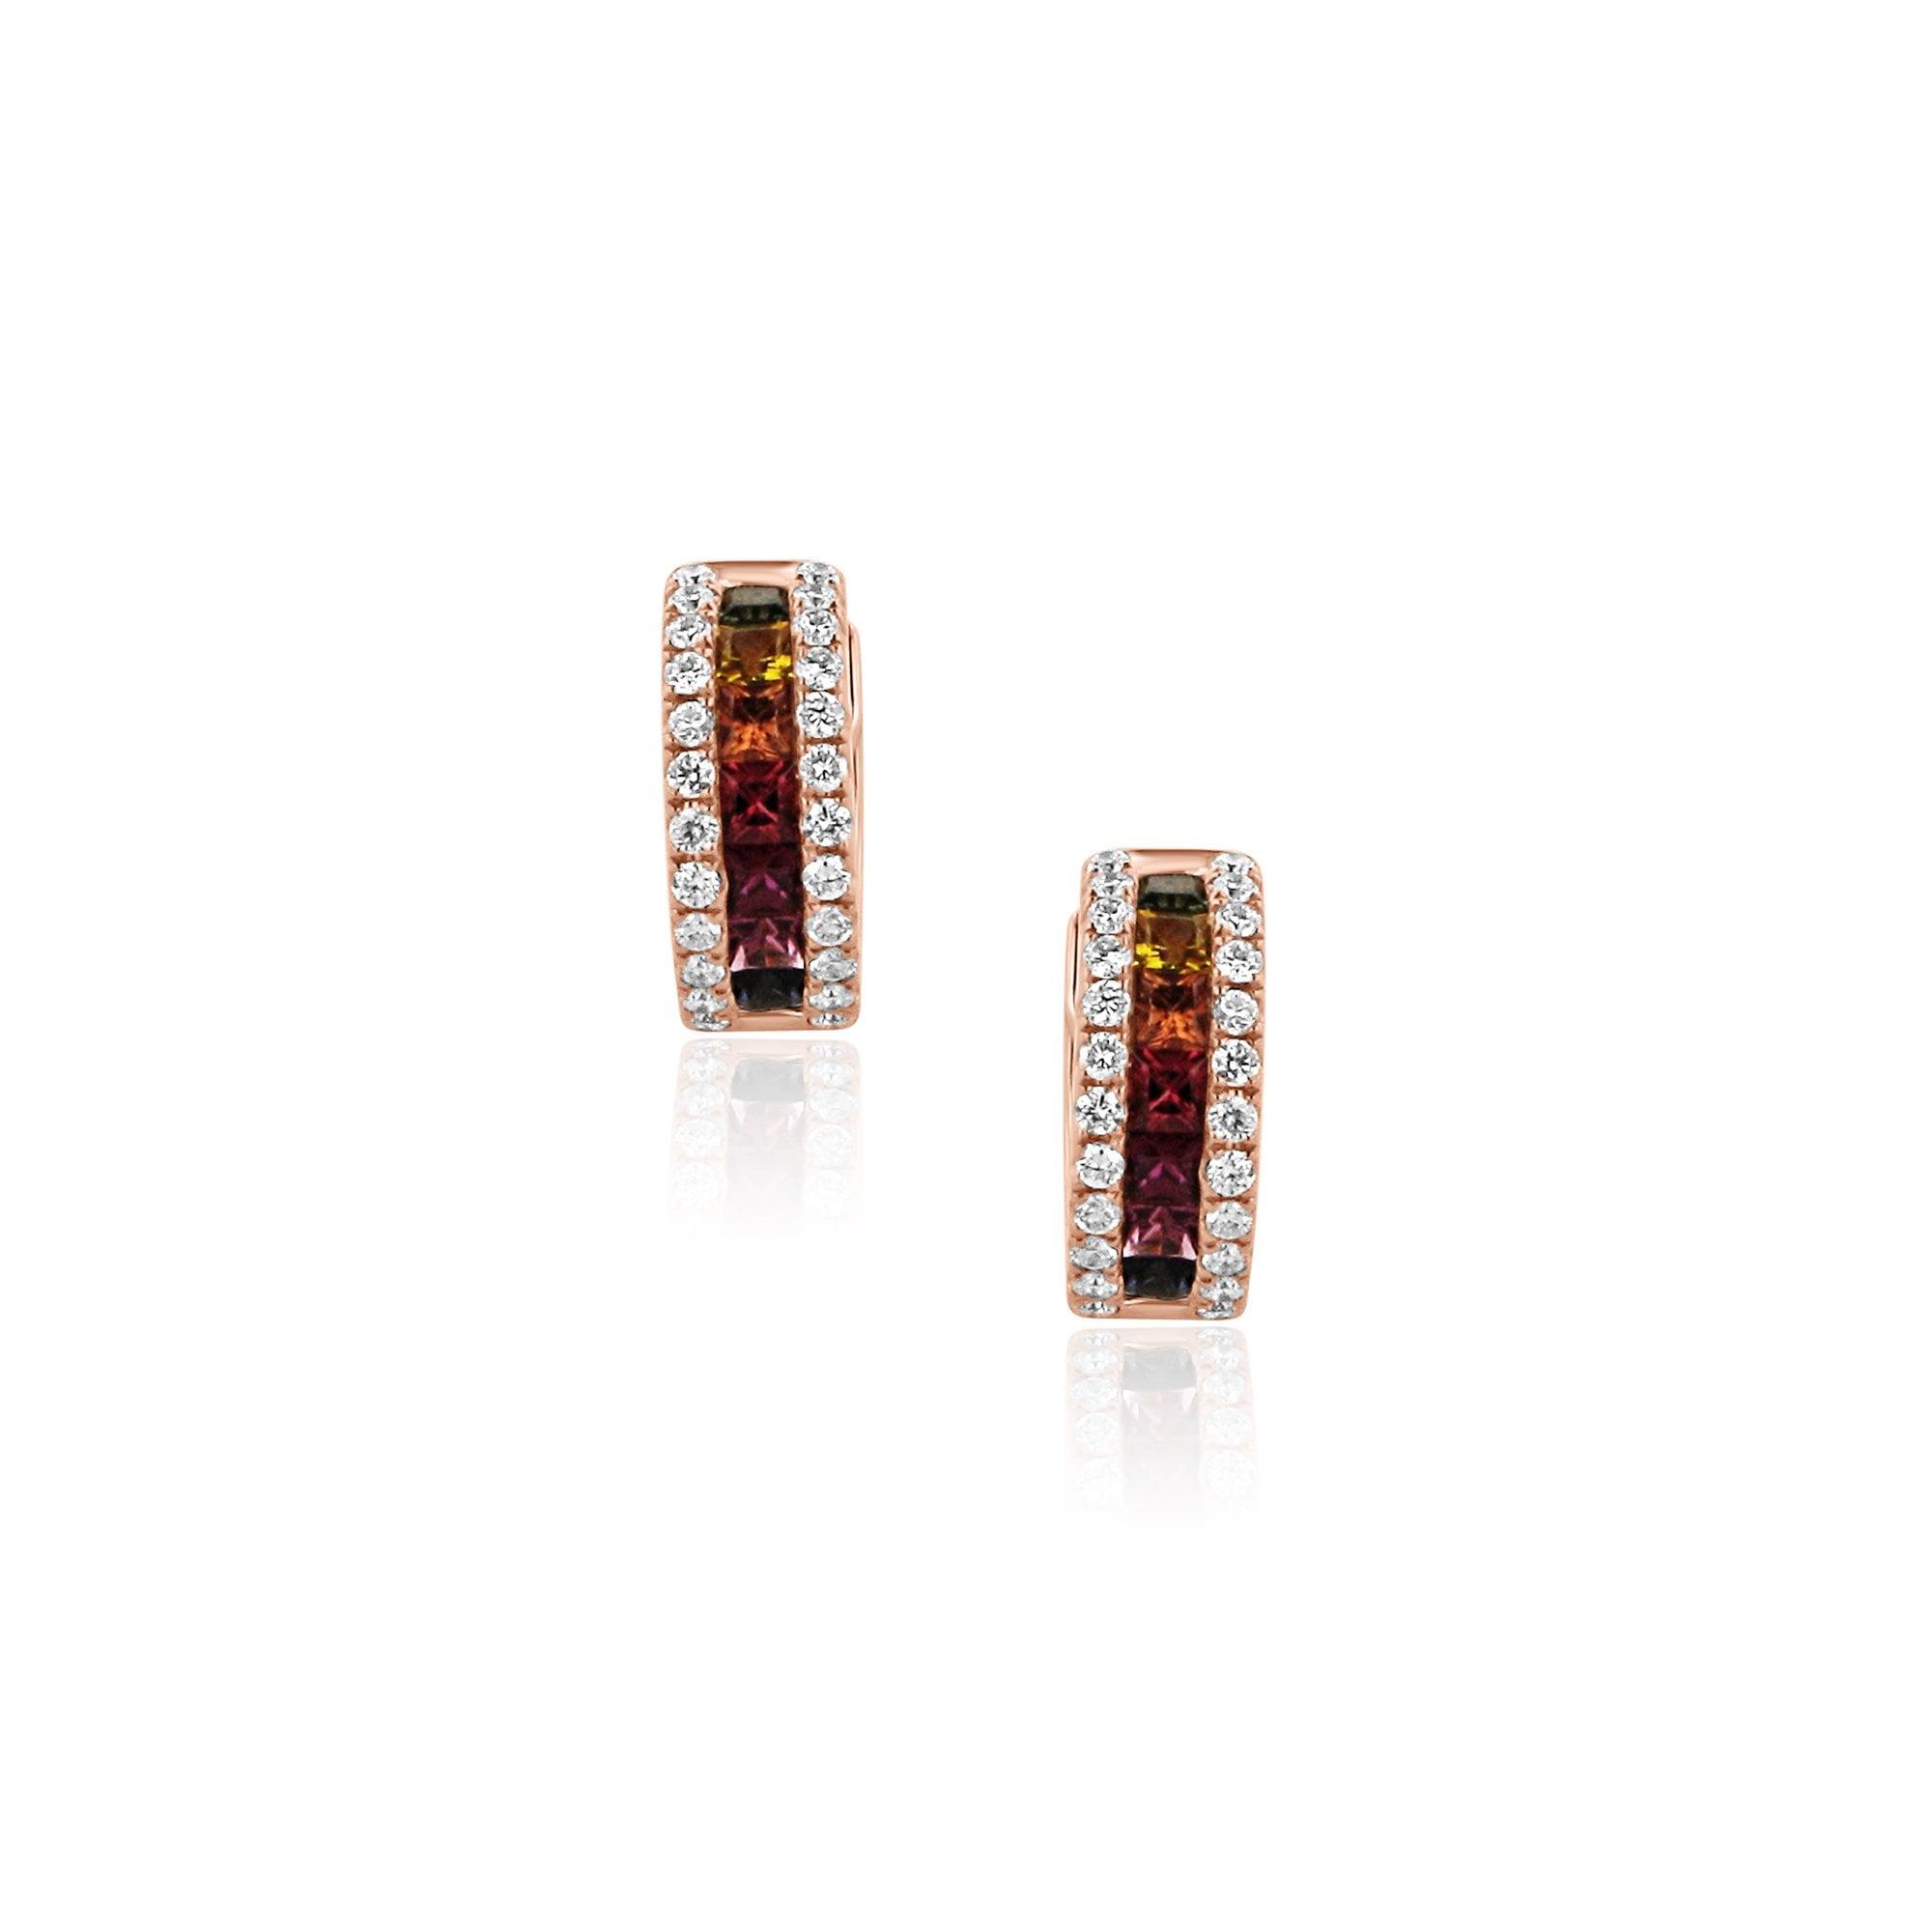 ae724f941 18ct Rose Gold Rainbow Sapphire and Diamond Huggie Hoop Earrings - Womens  from Avanti of Ashbourne Ltd UK